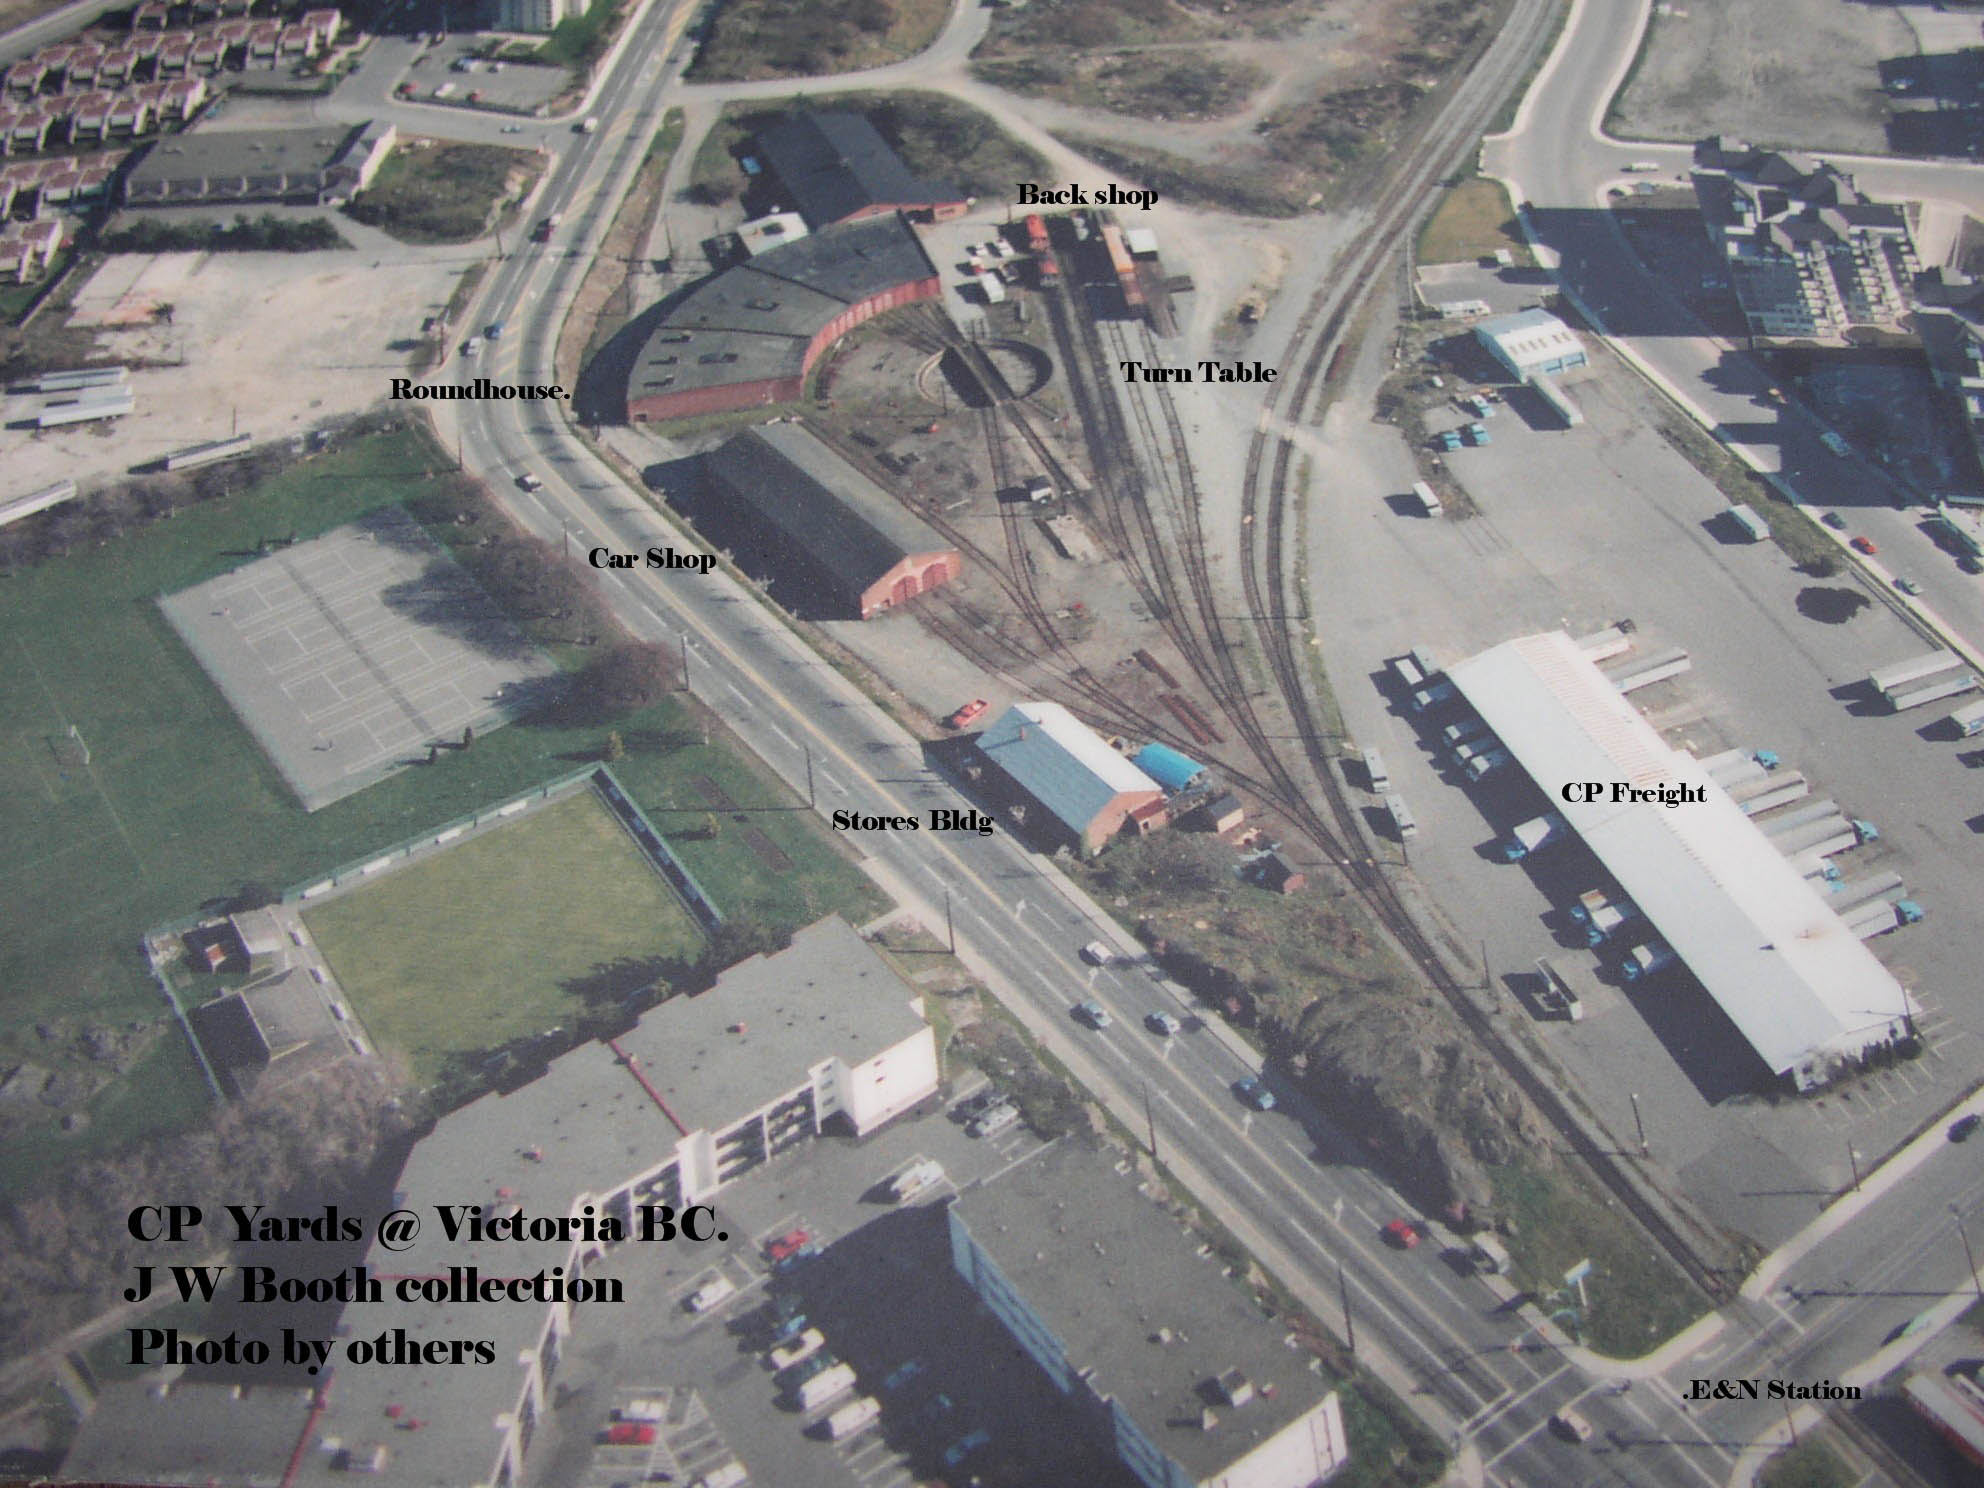 Aerial view of victoria vi shops